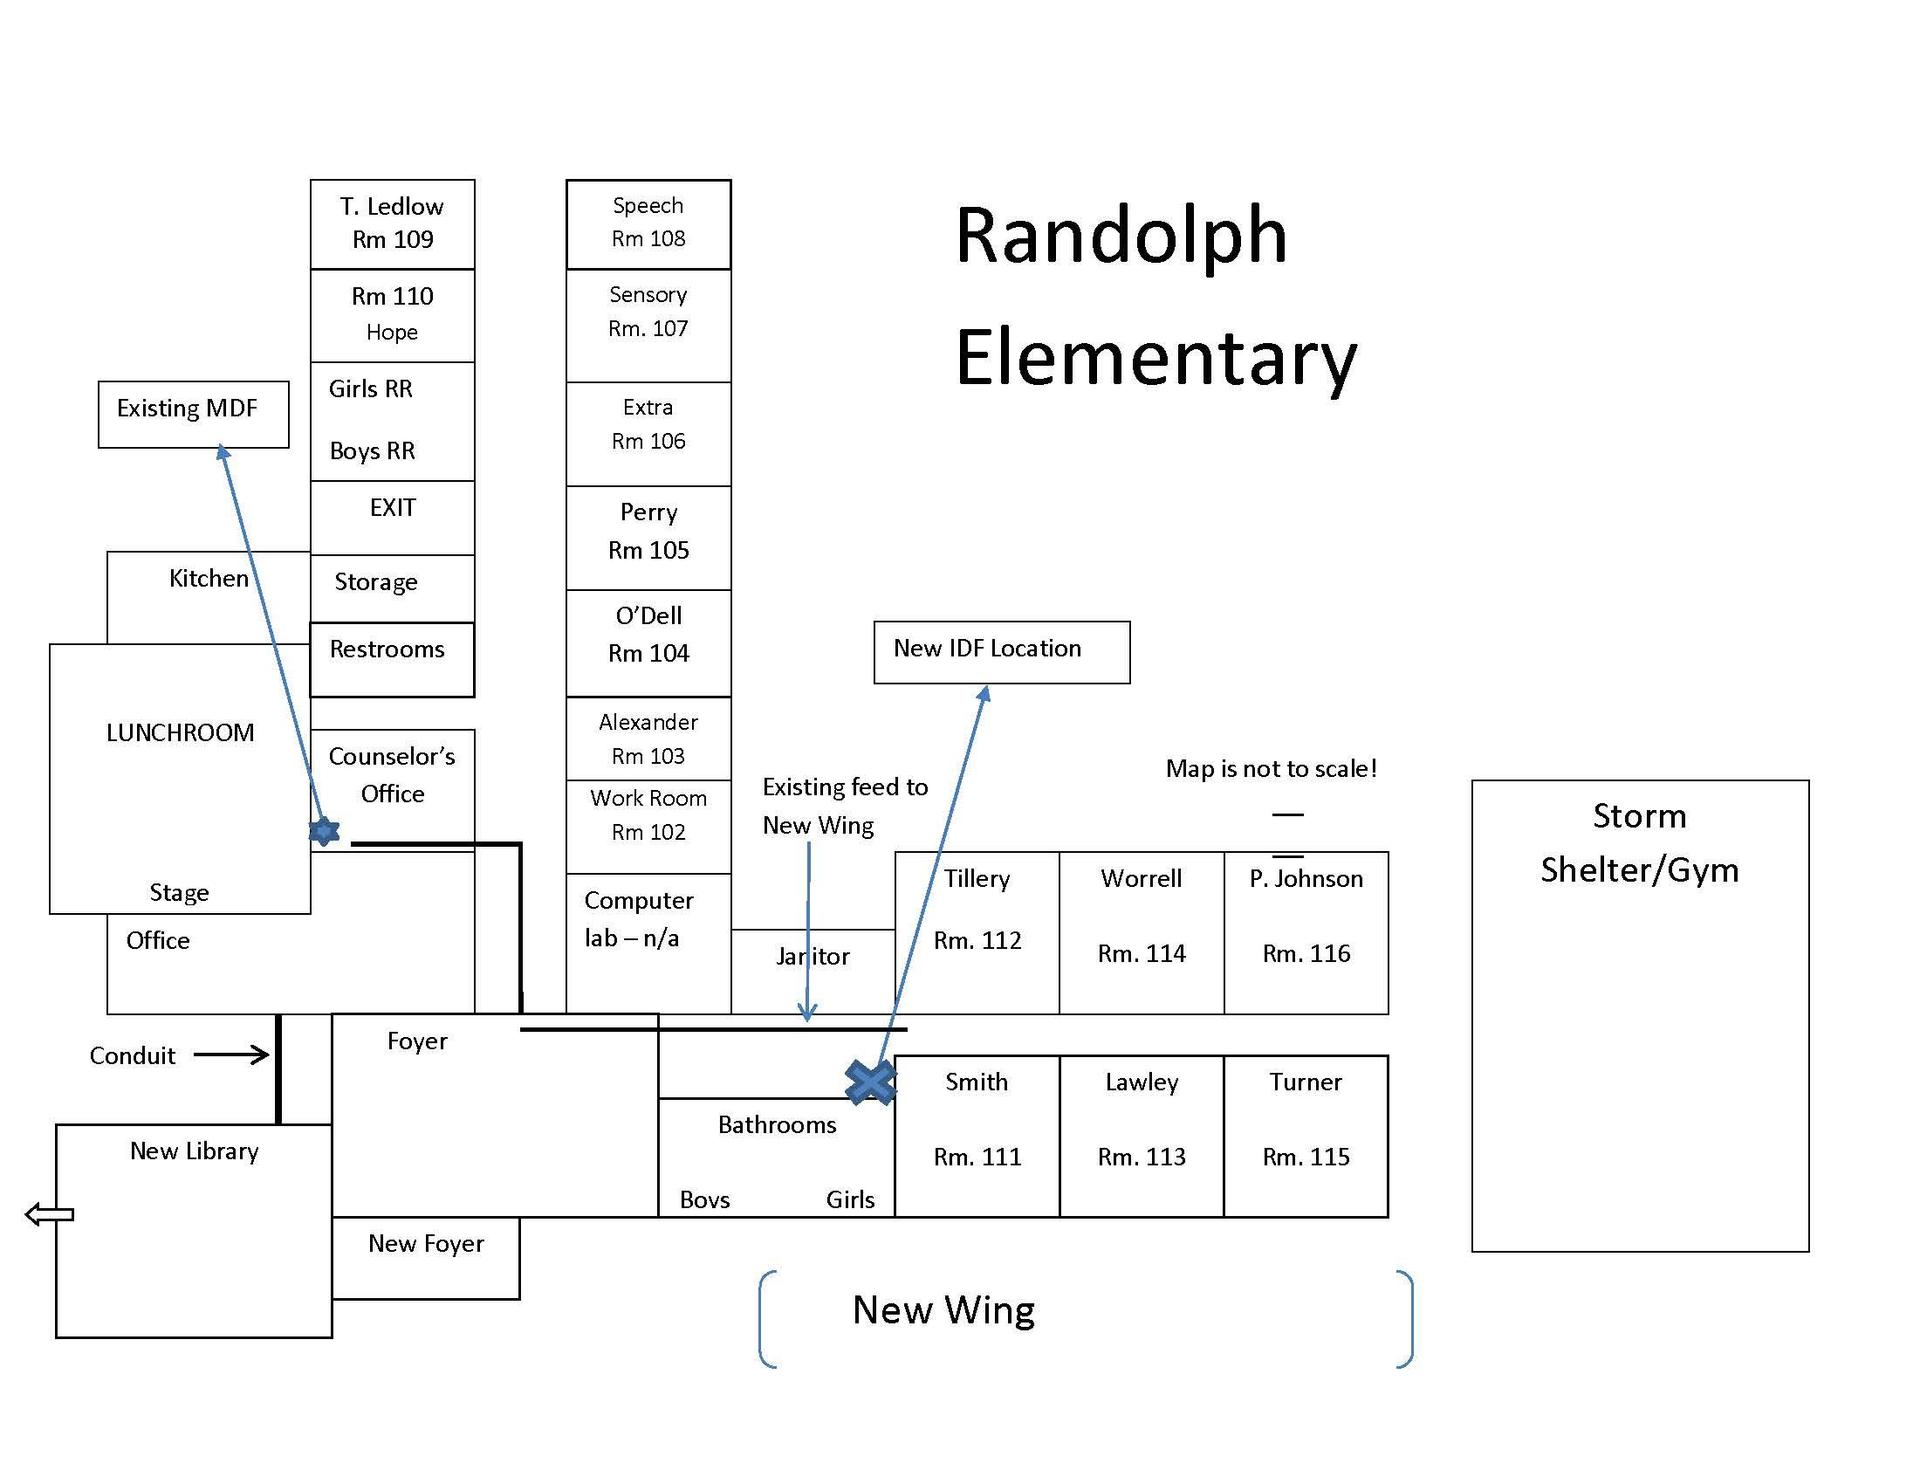 Randolph Elementary Floorplan with new IDF